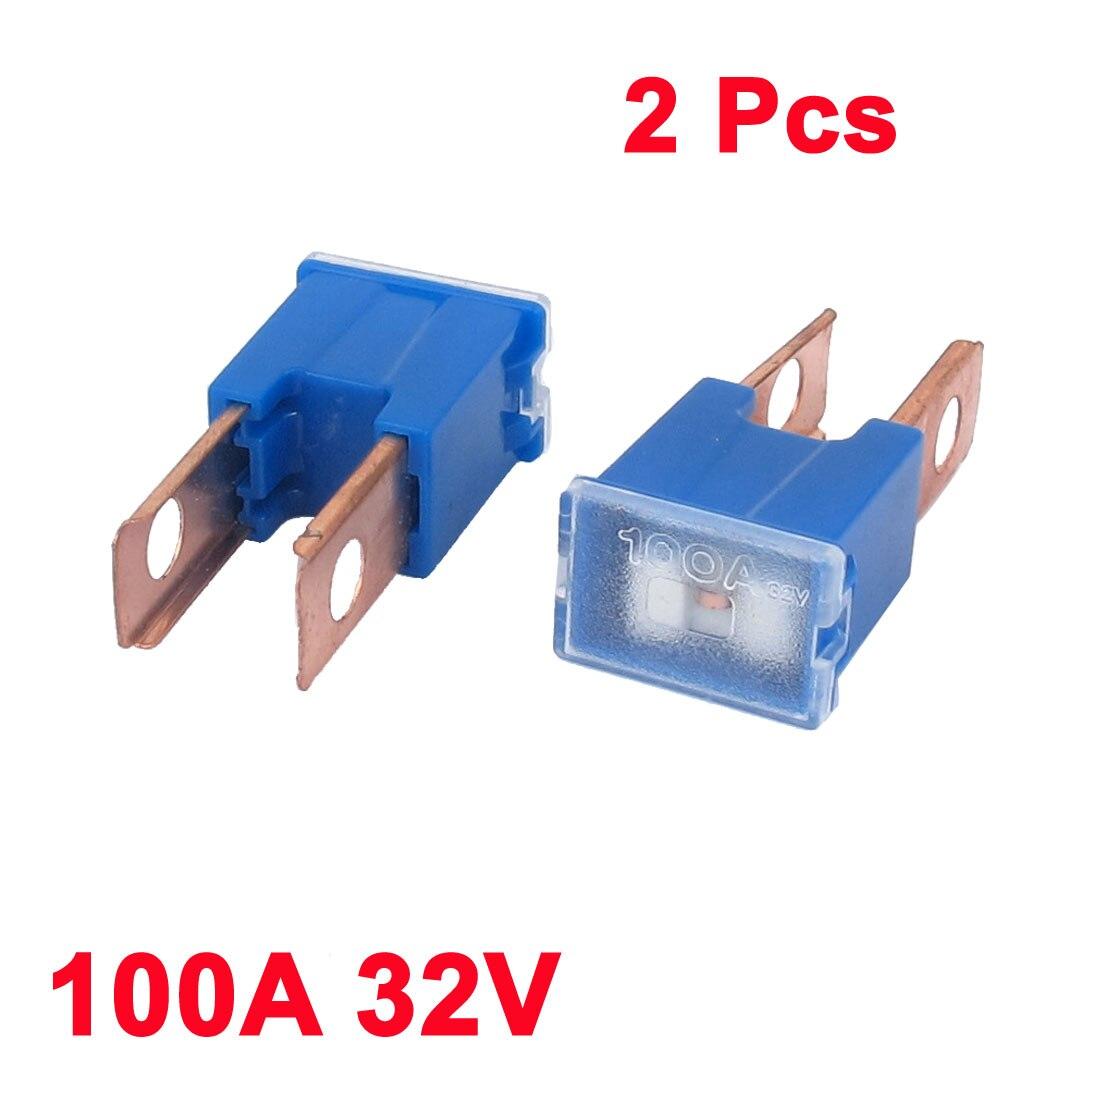 Pink 30A AMP 32V Female Plug in Blade Jcase Cartridge Standard PAL Fuse Top USA